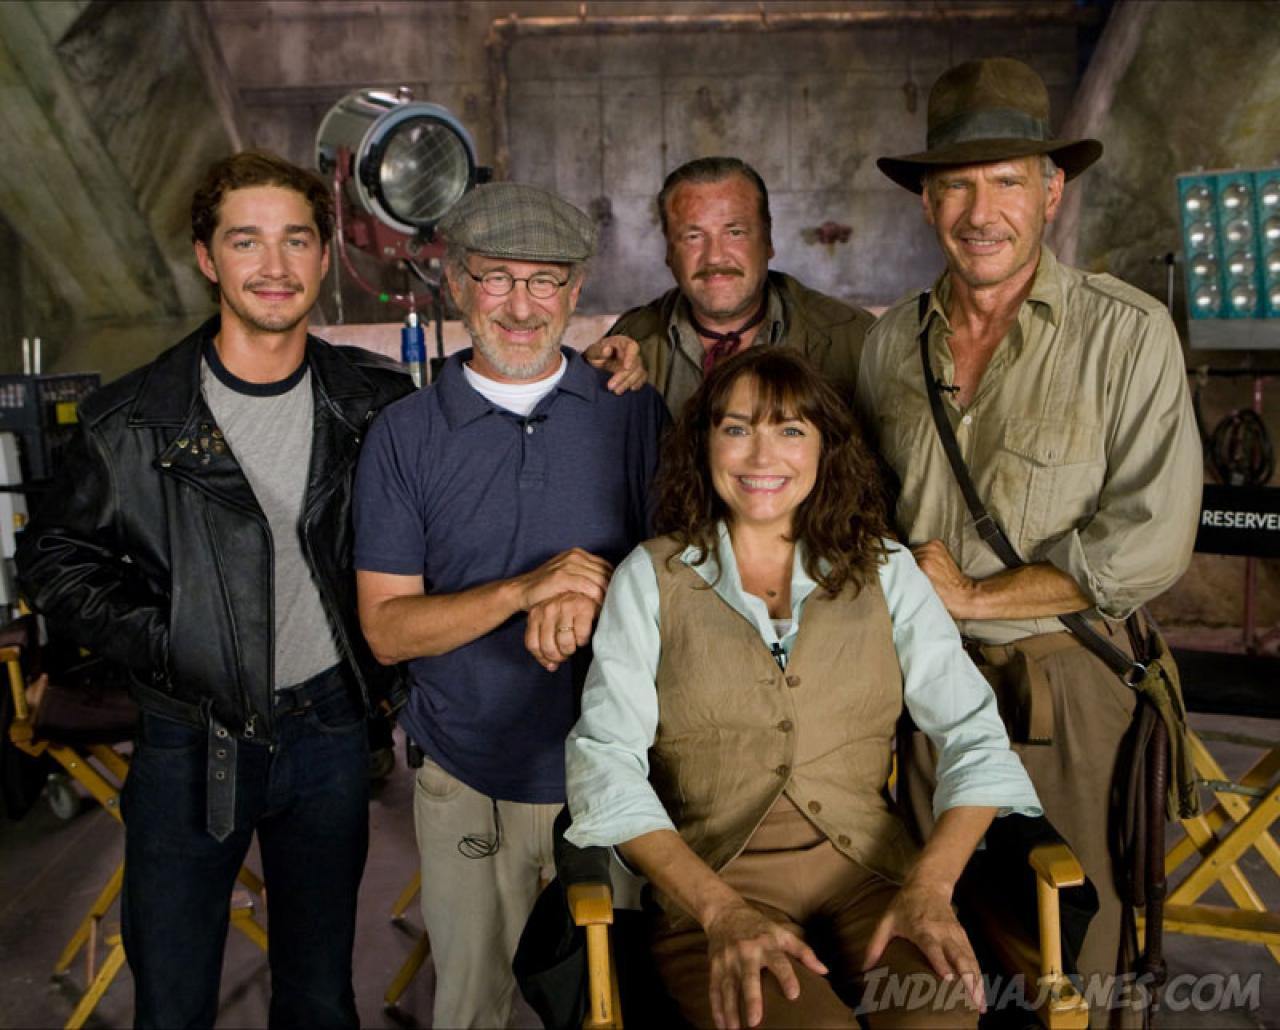 Features Film Indiana Jones - Screentime ie